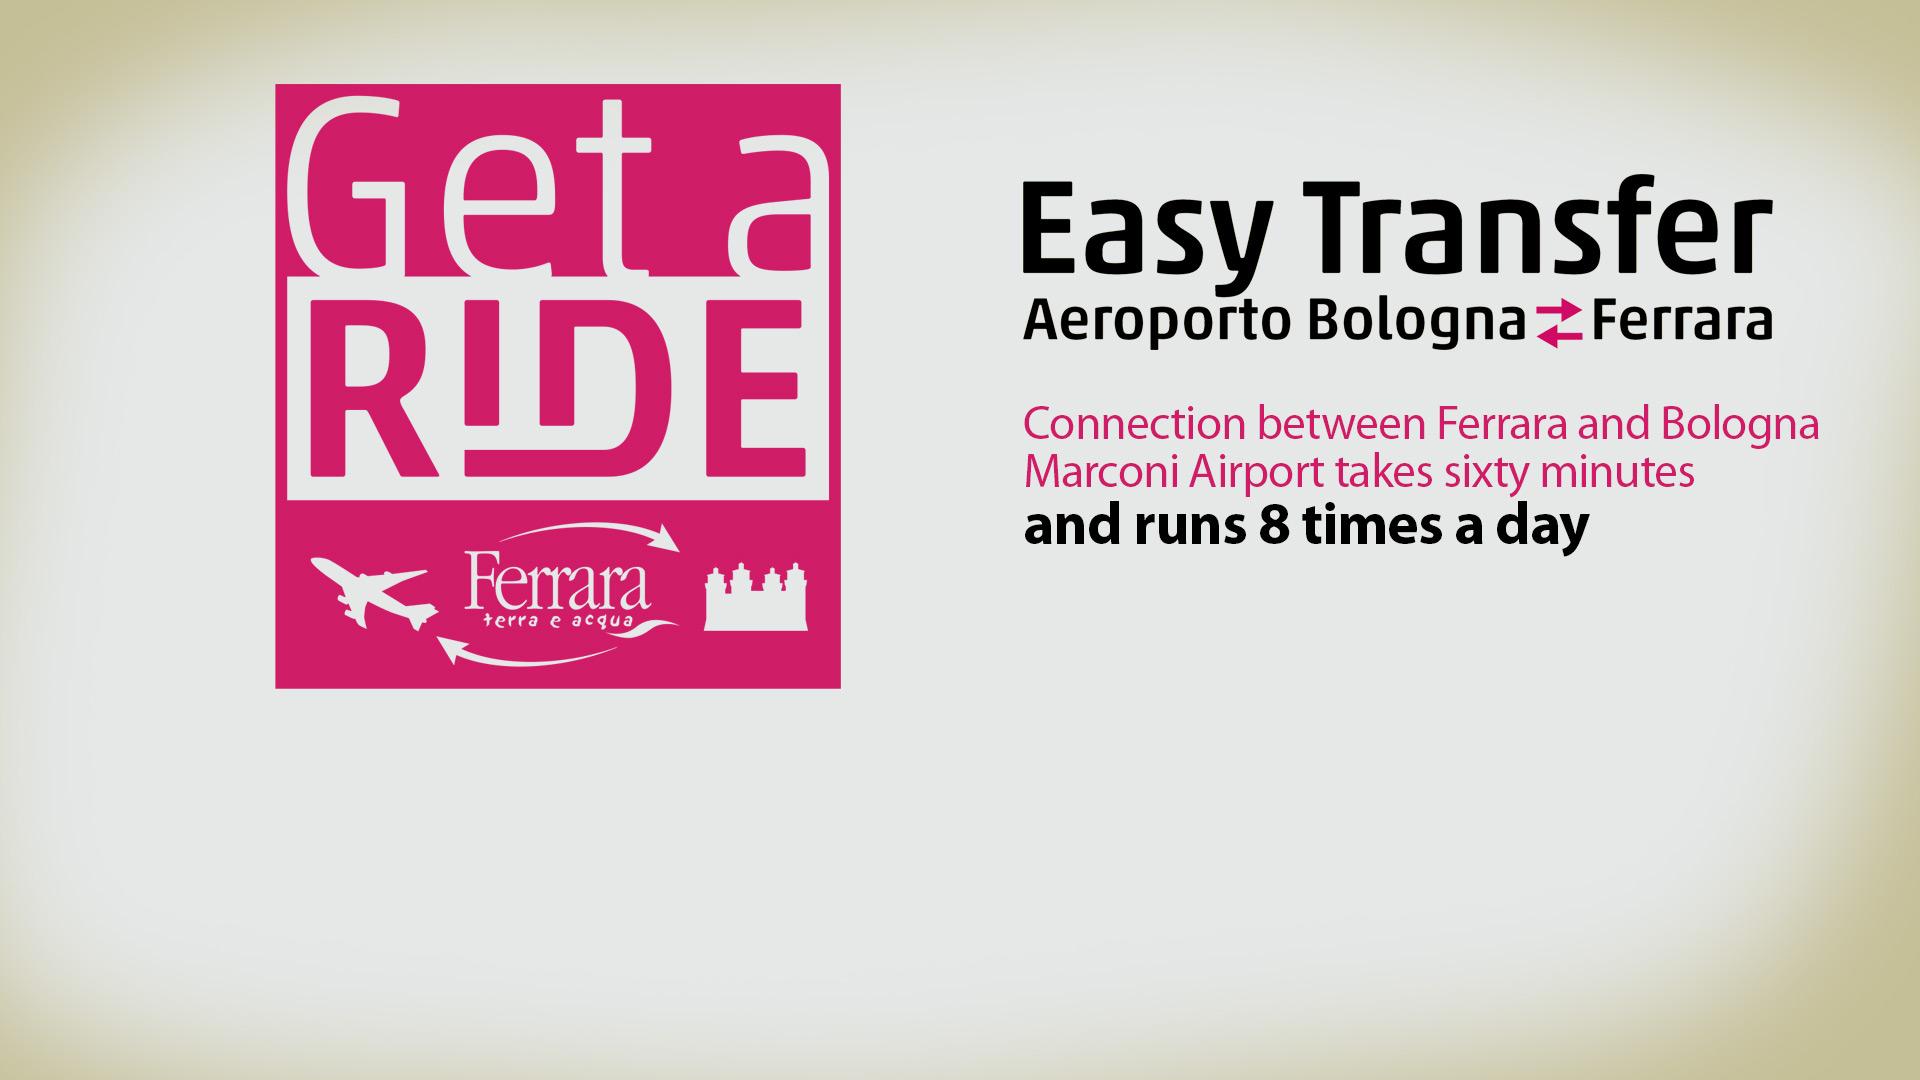 Airport EasyTransfer